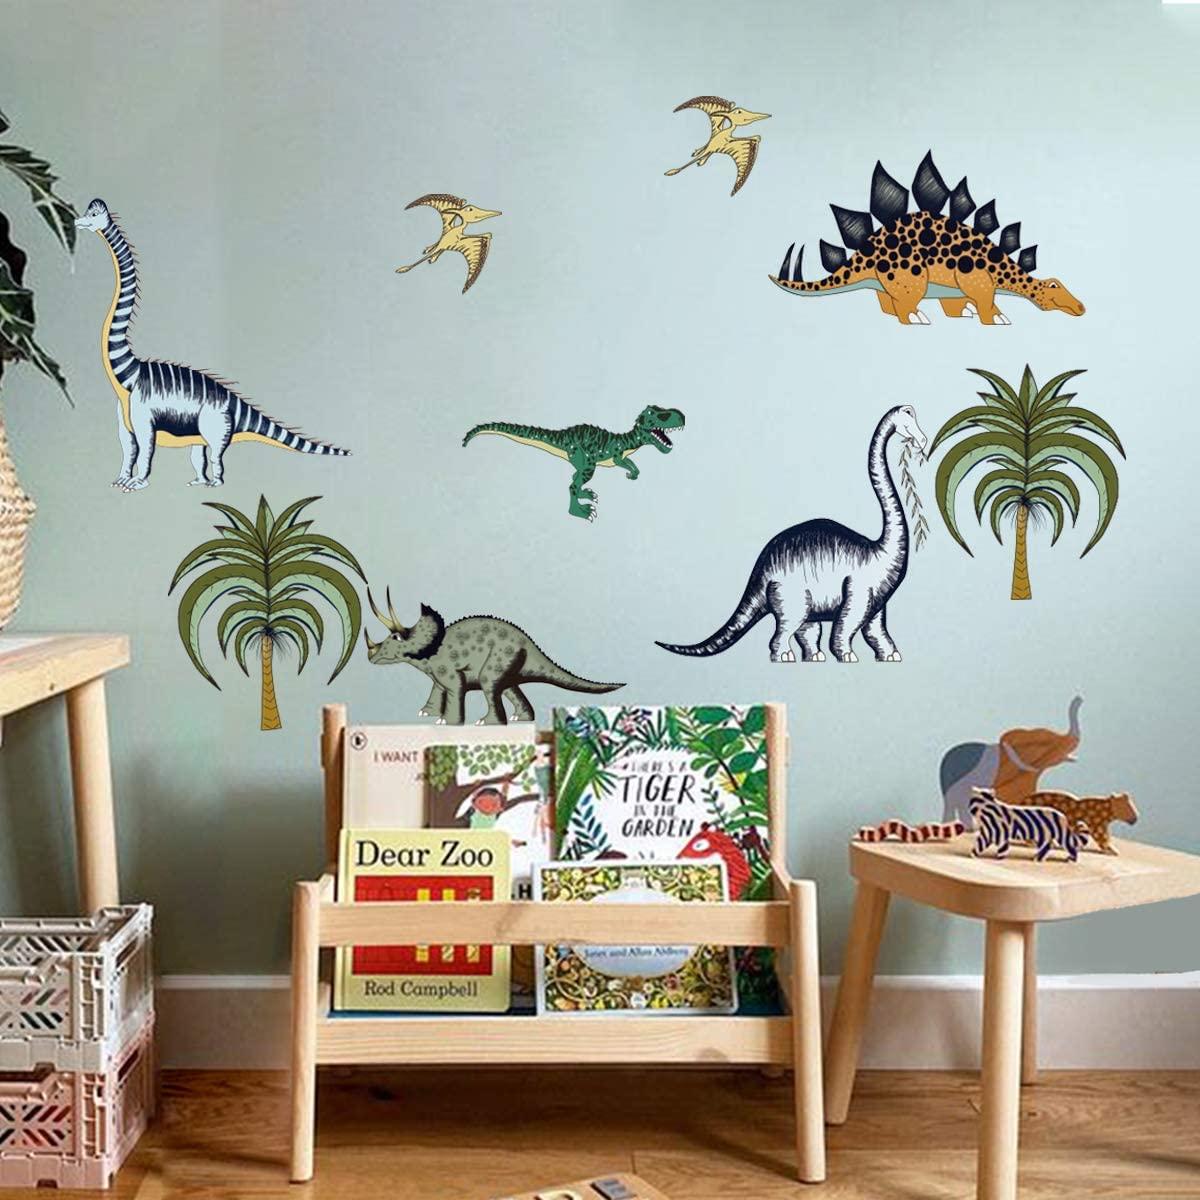 decalmile Dinosaur Wall Decals Jungle Animals Palm Tree Wall Stickers Baby Nursery Boys Bedroom Playroom Wall Decor